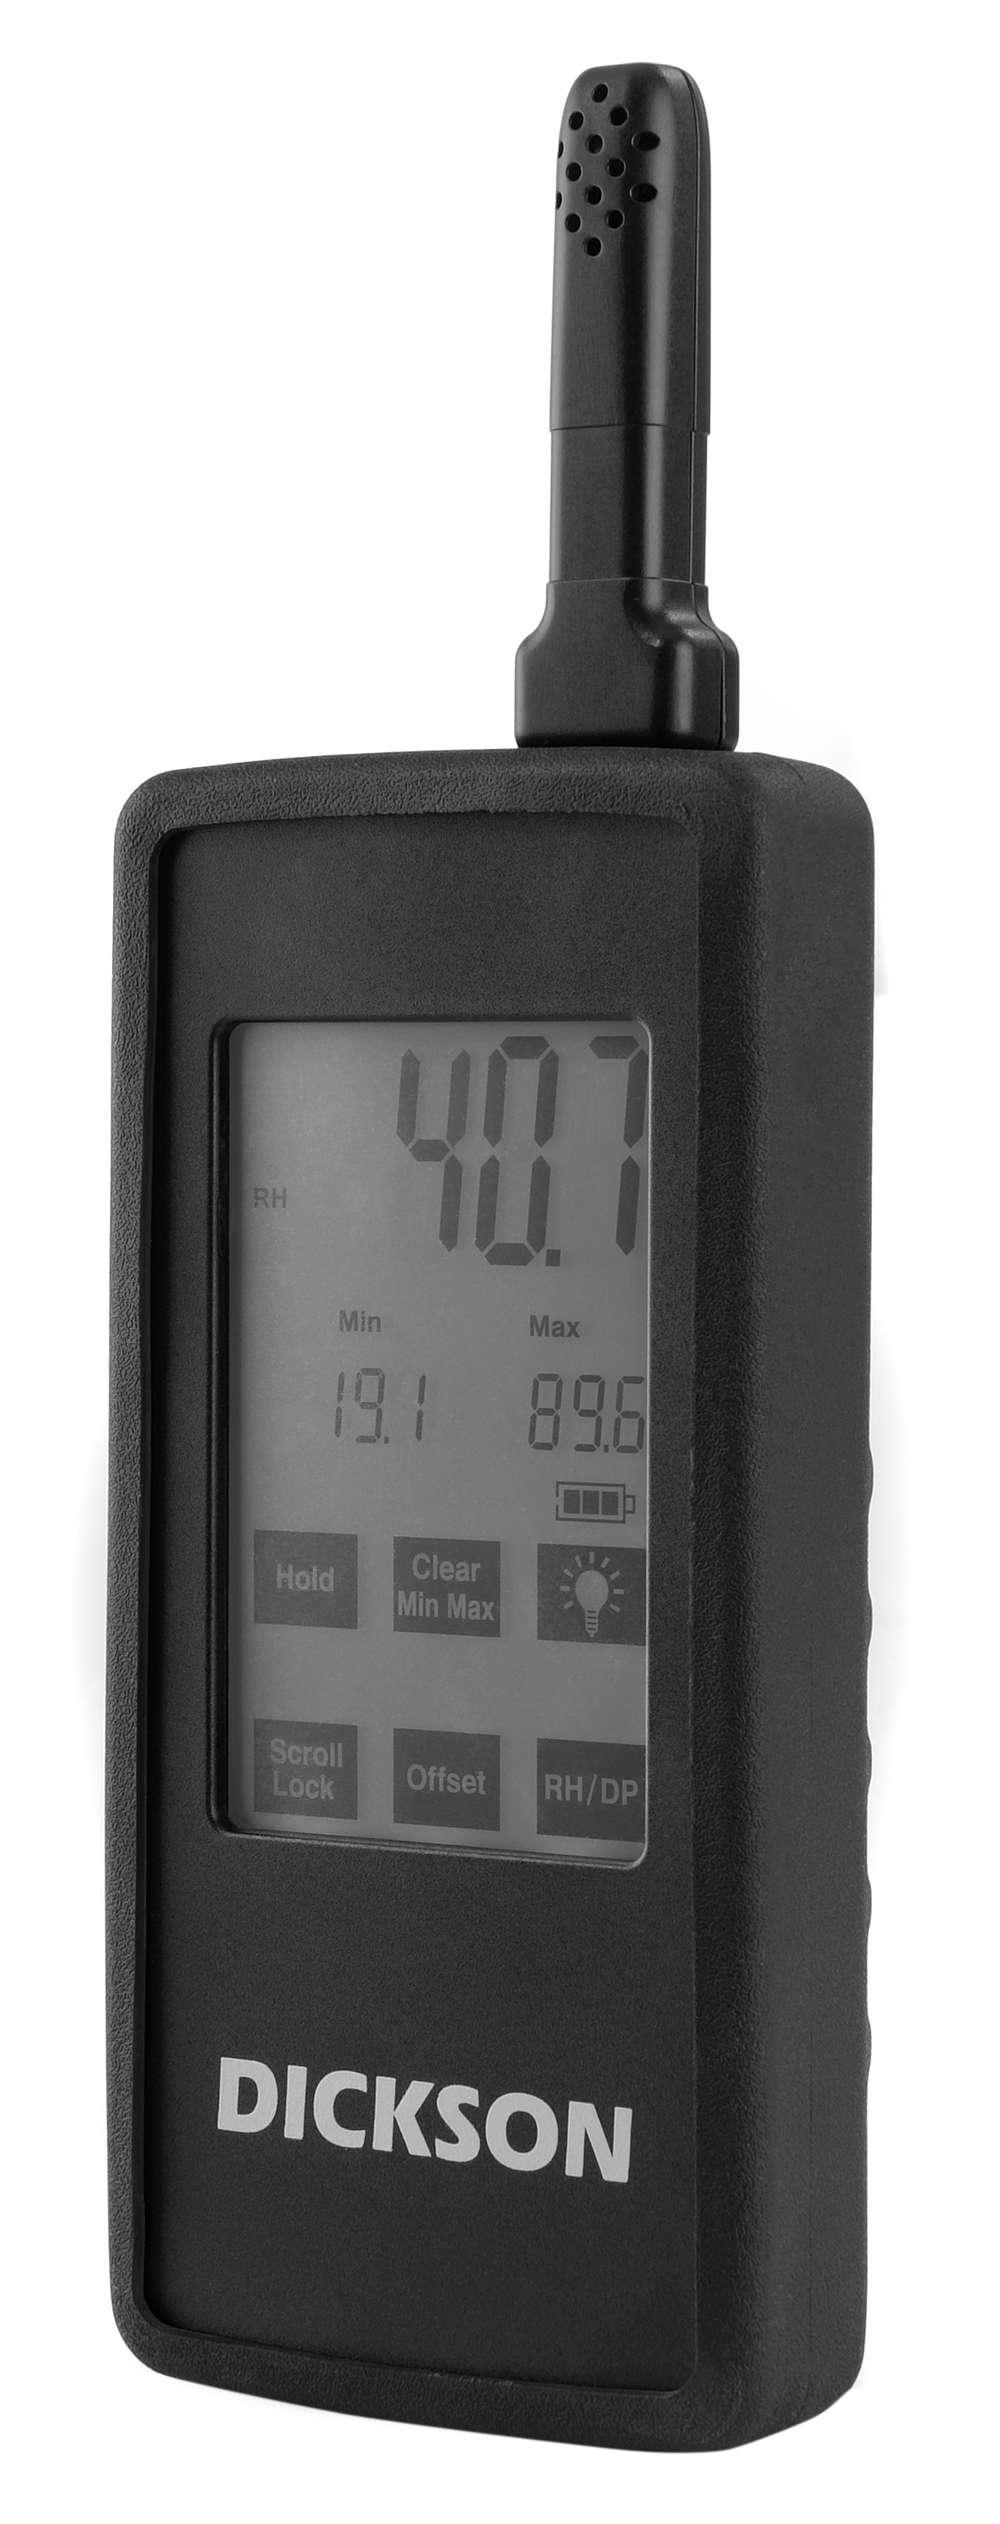 Th700 indicator angle 1 w probe 12252